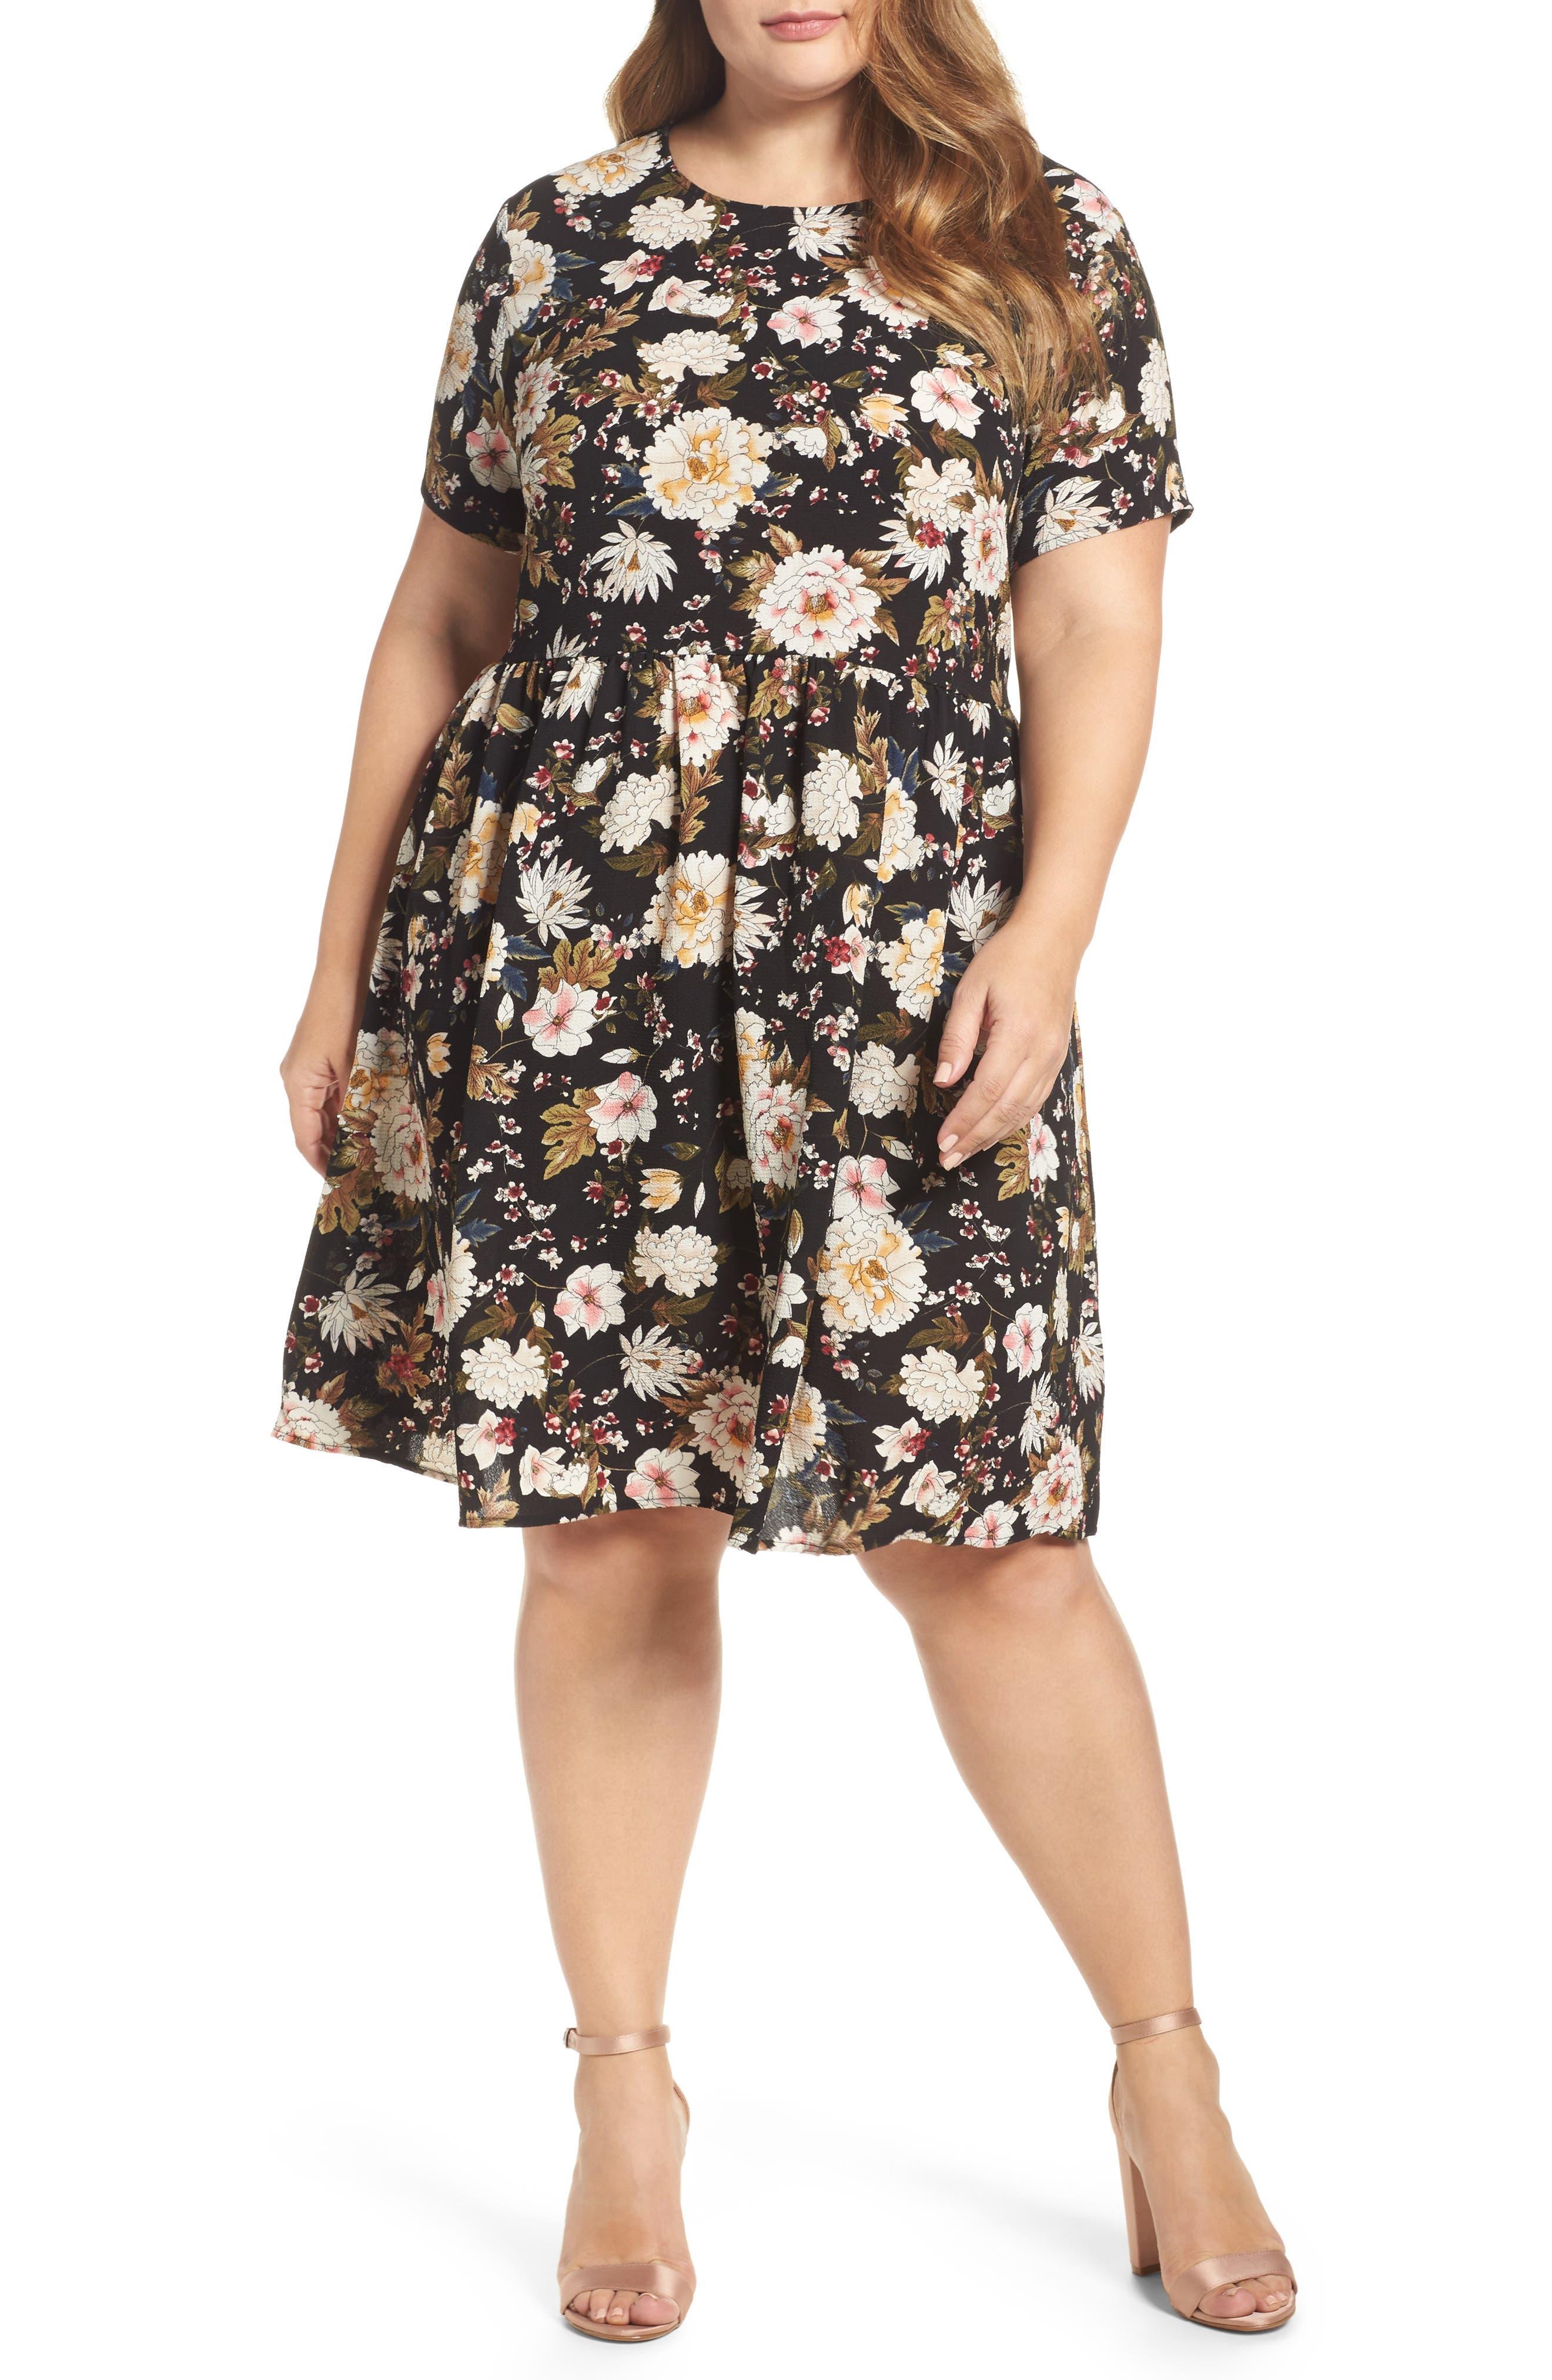 Alternate Image 1 Selected - Glamorous Empire Waist Floral Print Dress (Plus Size)